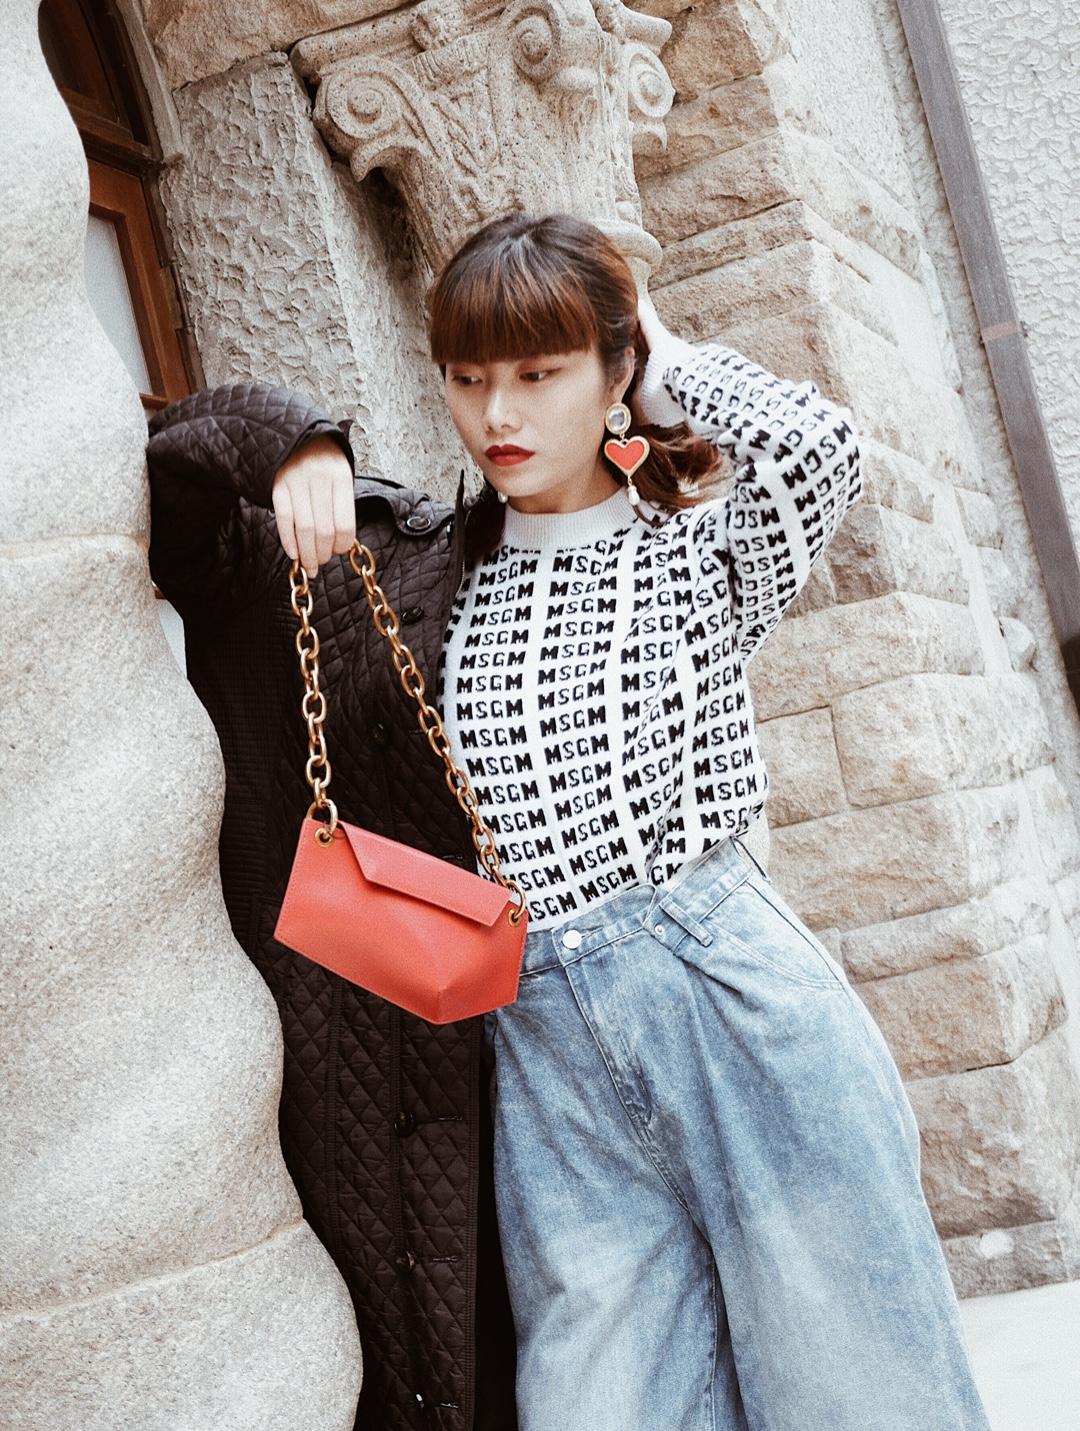 Fake 姐穿搭日志 | #过年胖三斤就靠这些衣服遮了# 在秋冬季节,虽说每年都有它自带的流行色,相对于流行色来说,黑色不管在什么时候,永远也排在时尚的前列,黑色大衣相对来说对肤色没什么挑剔,而且搭配也很容易,所以秋冬人人都应该有一件黑色大衣。搭配红色包包点亮全身